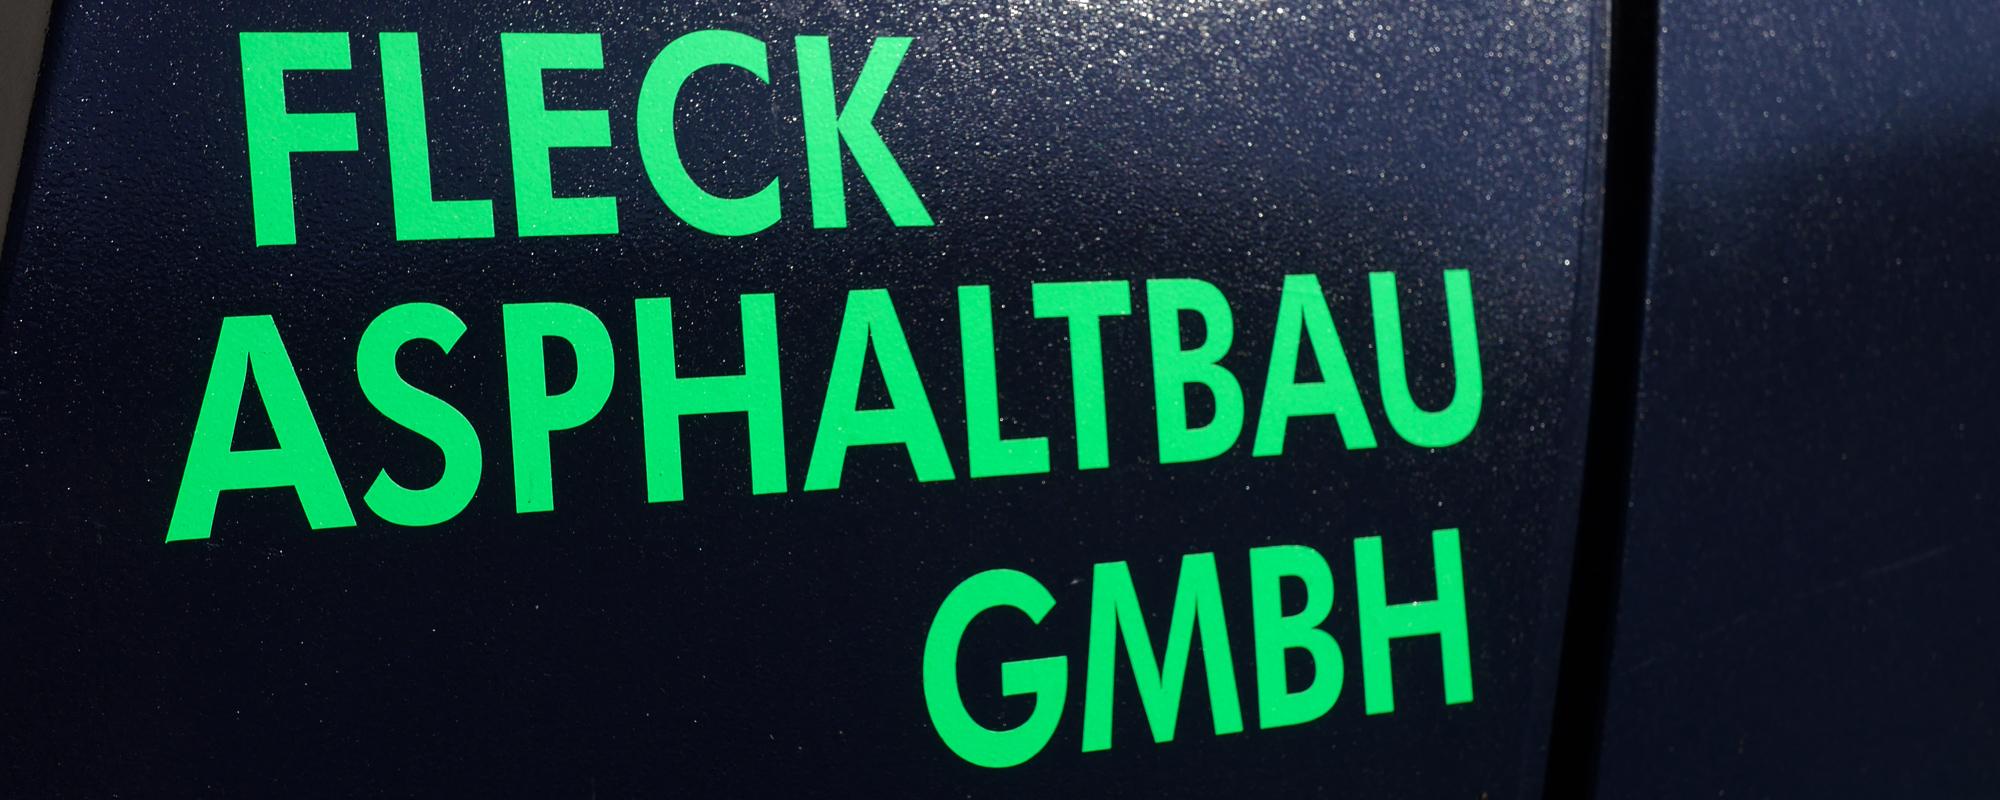 Fleck-Asphaltbau-GmbH-HGT